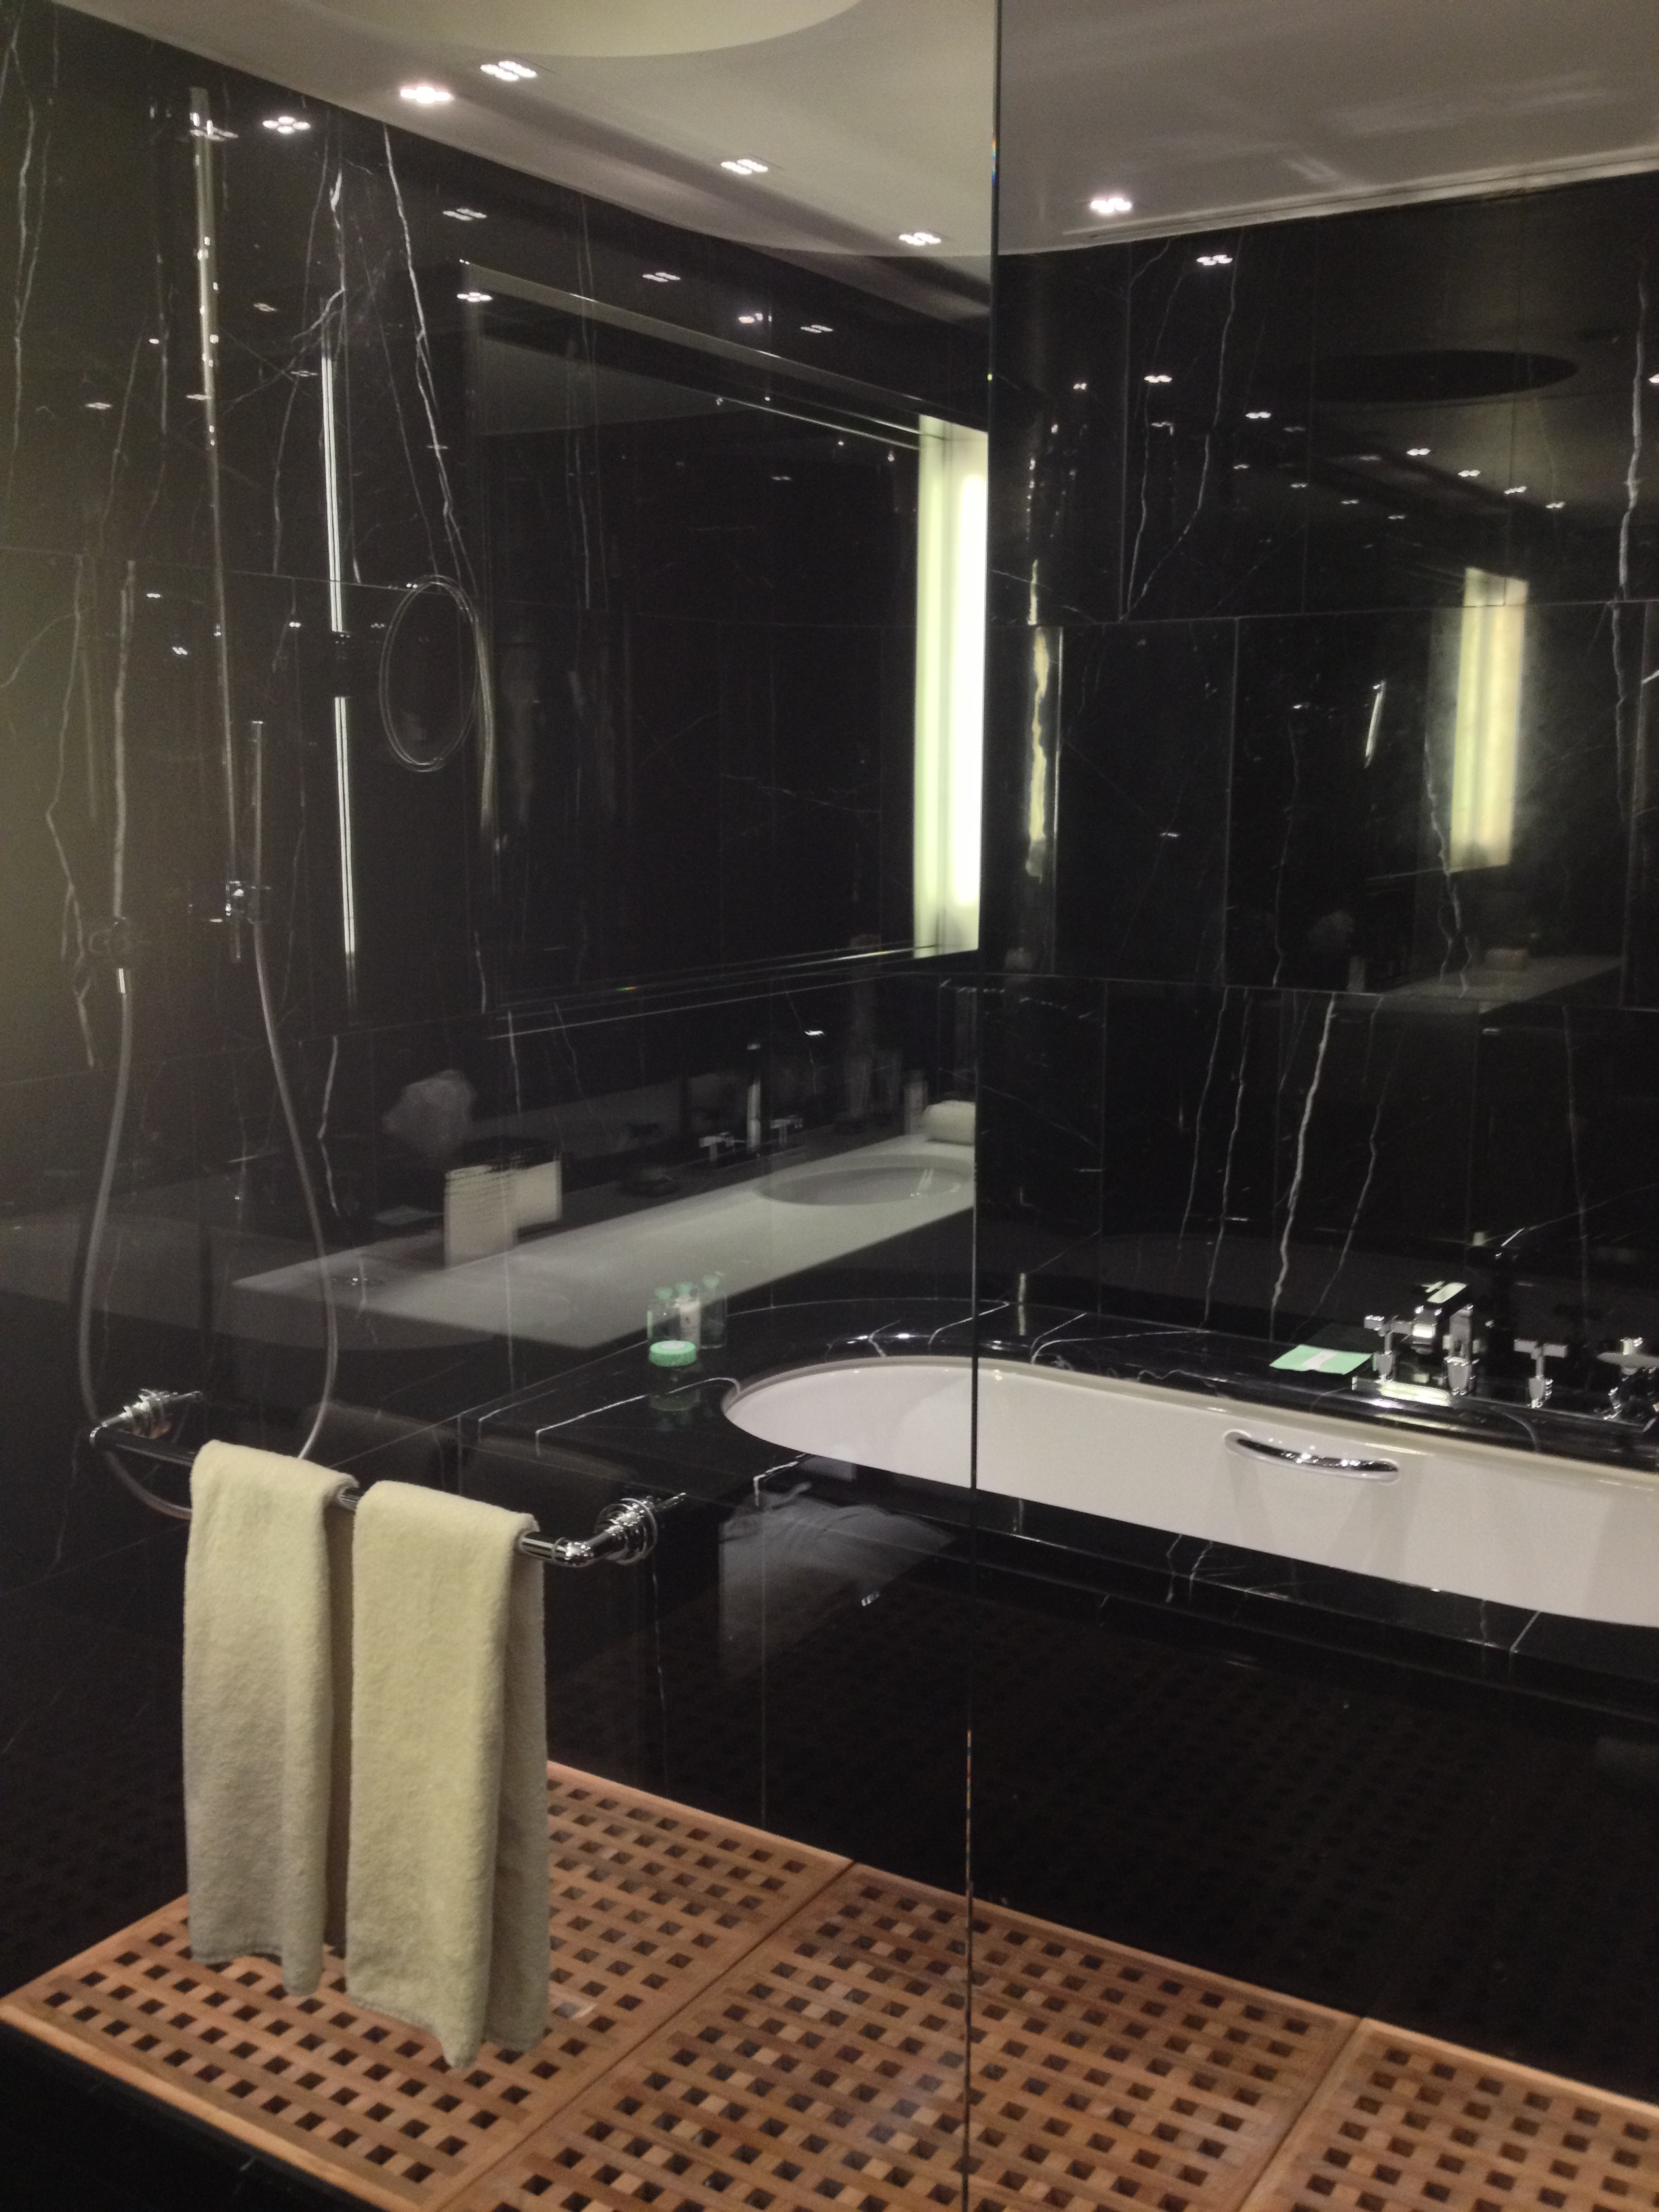 Chic bathroom bulgari london mr wallace travel for Bathroom design london